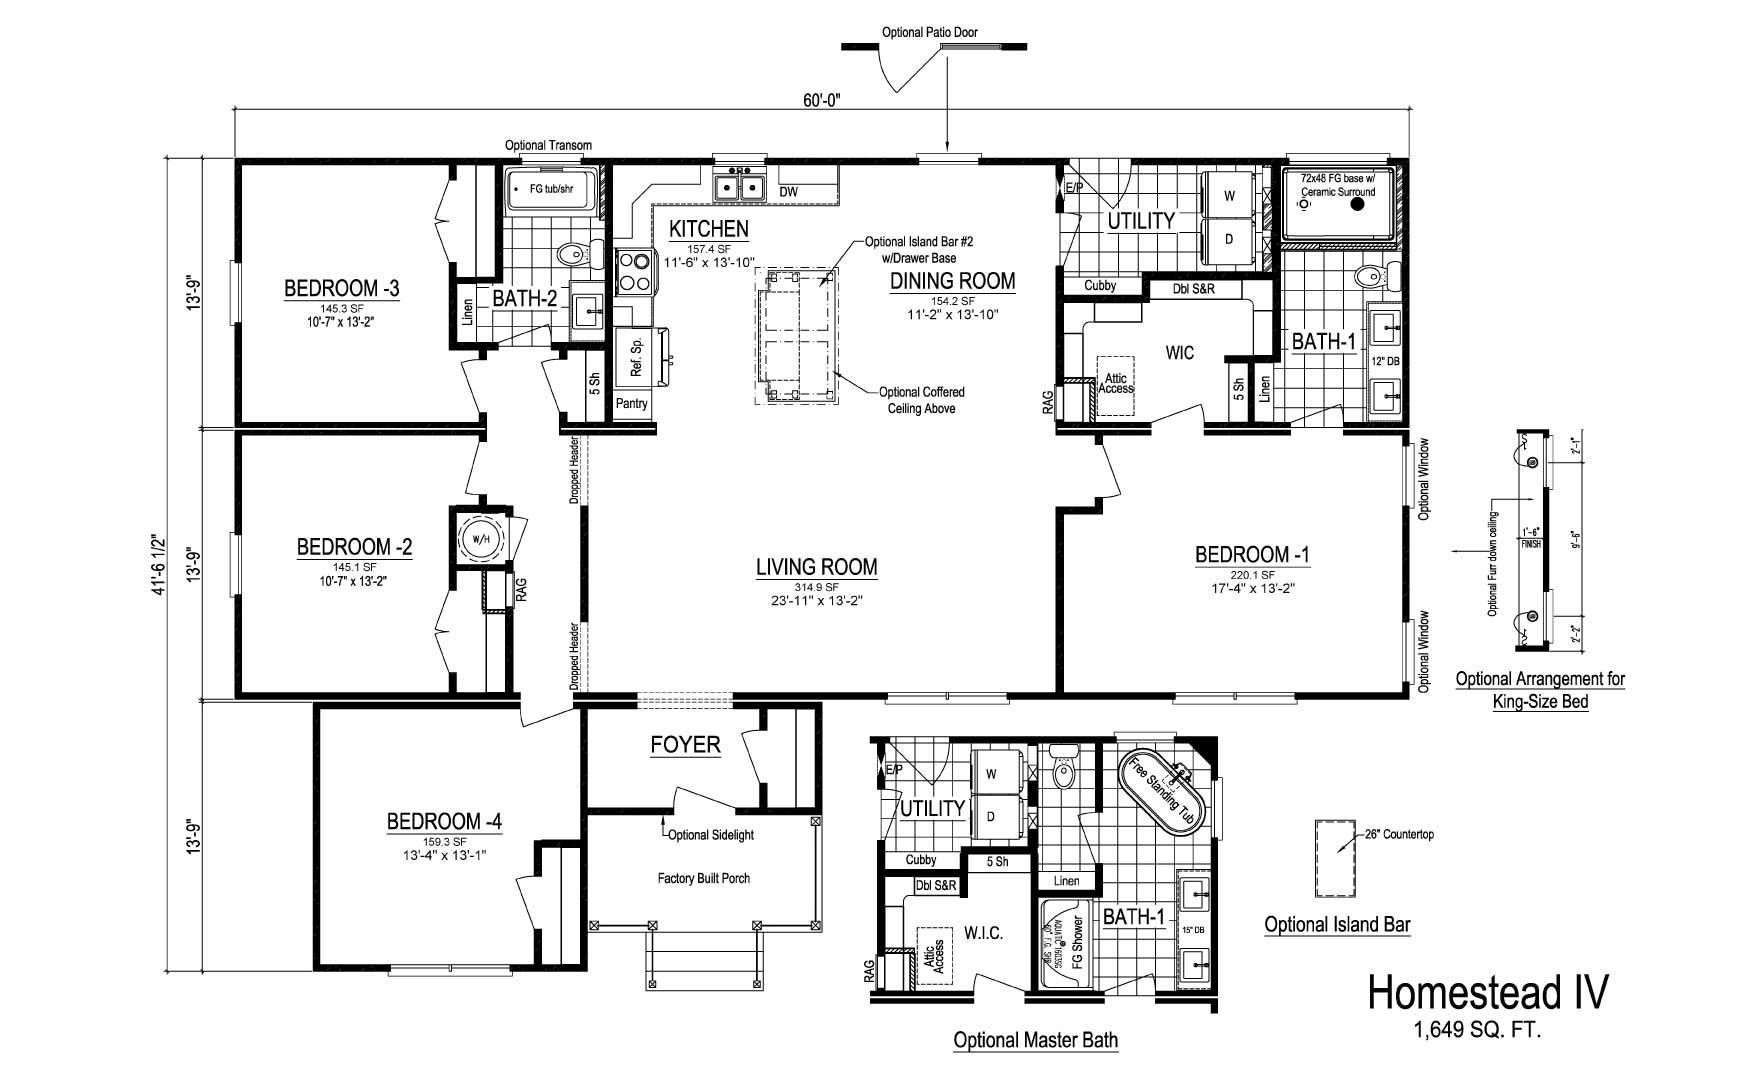 Homestead IV Ranch Modular Home Floor Plan